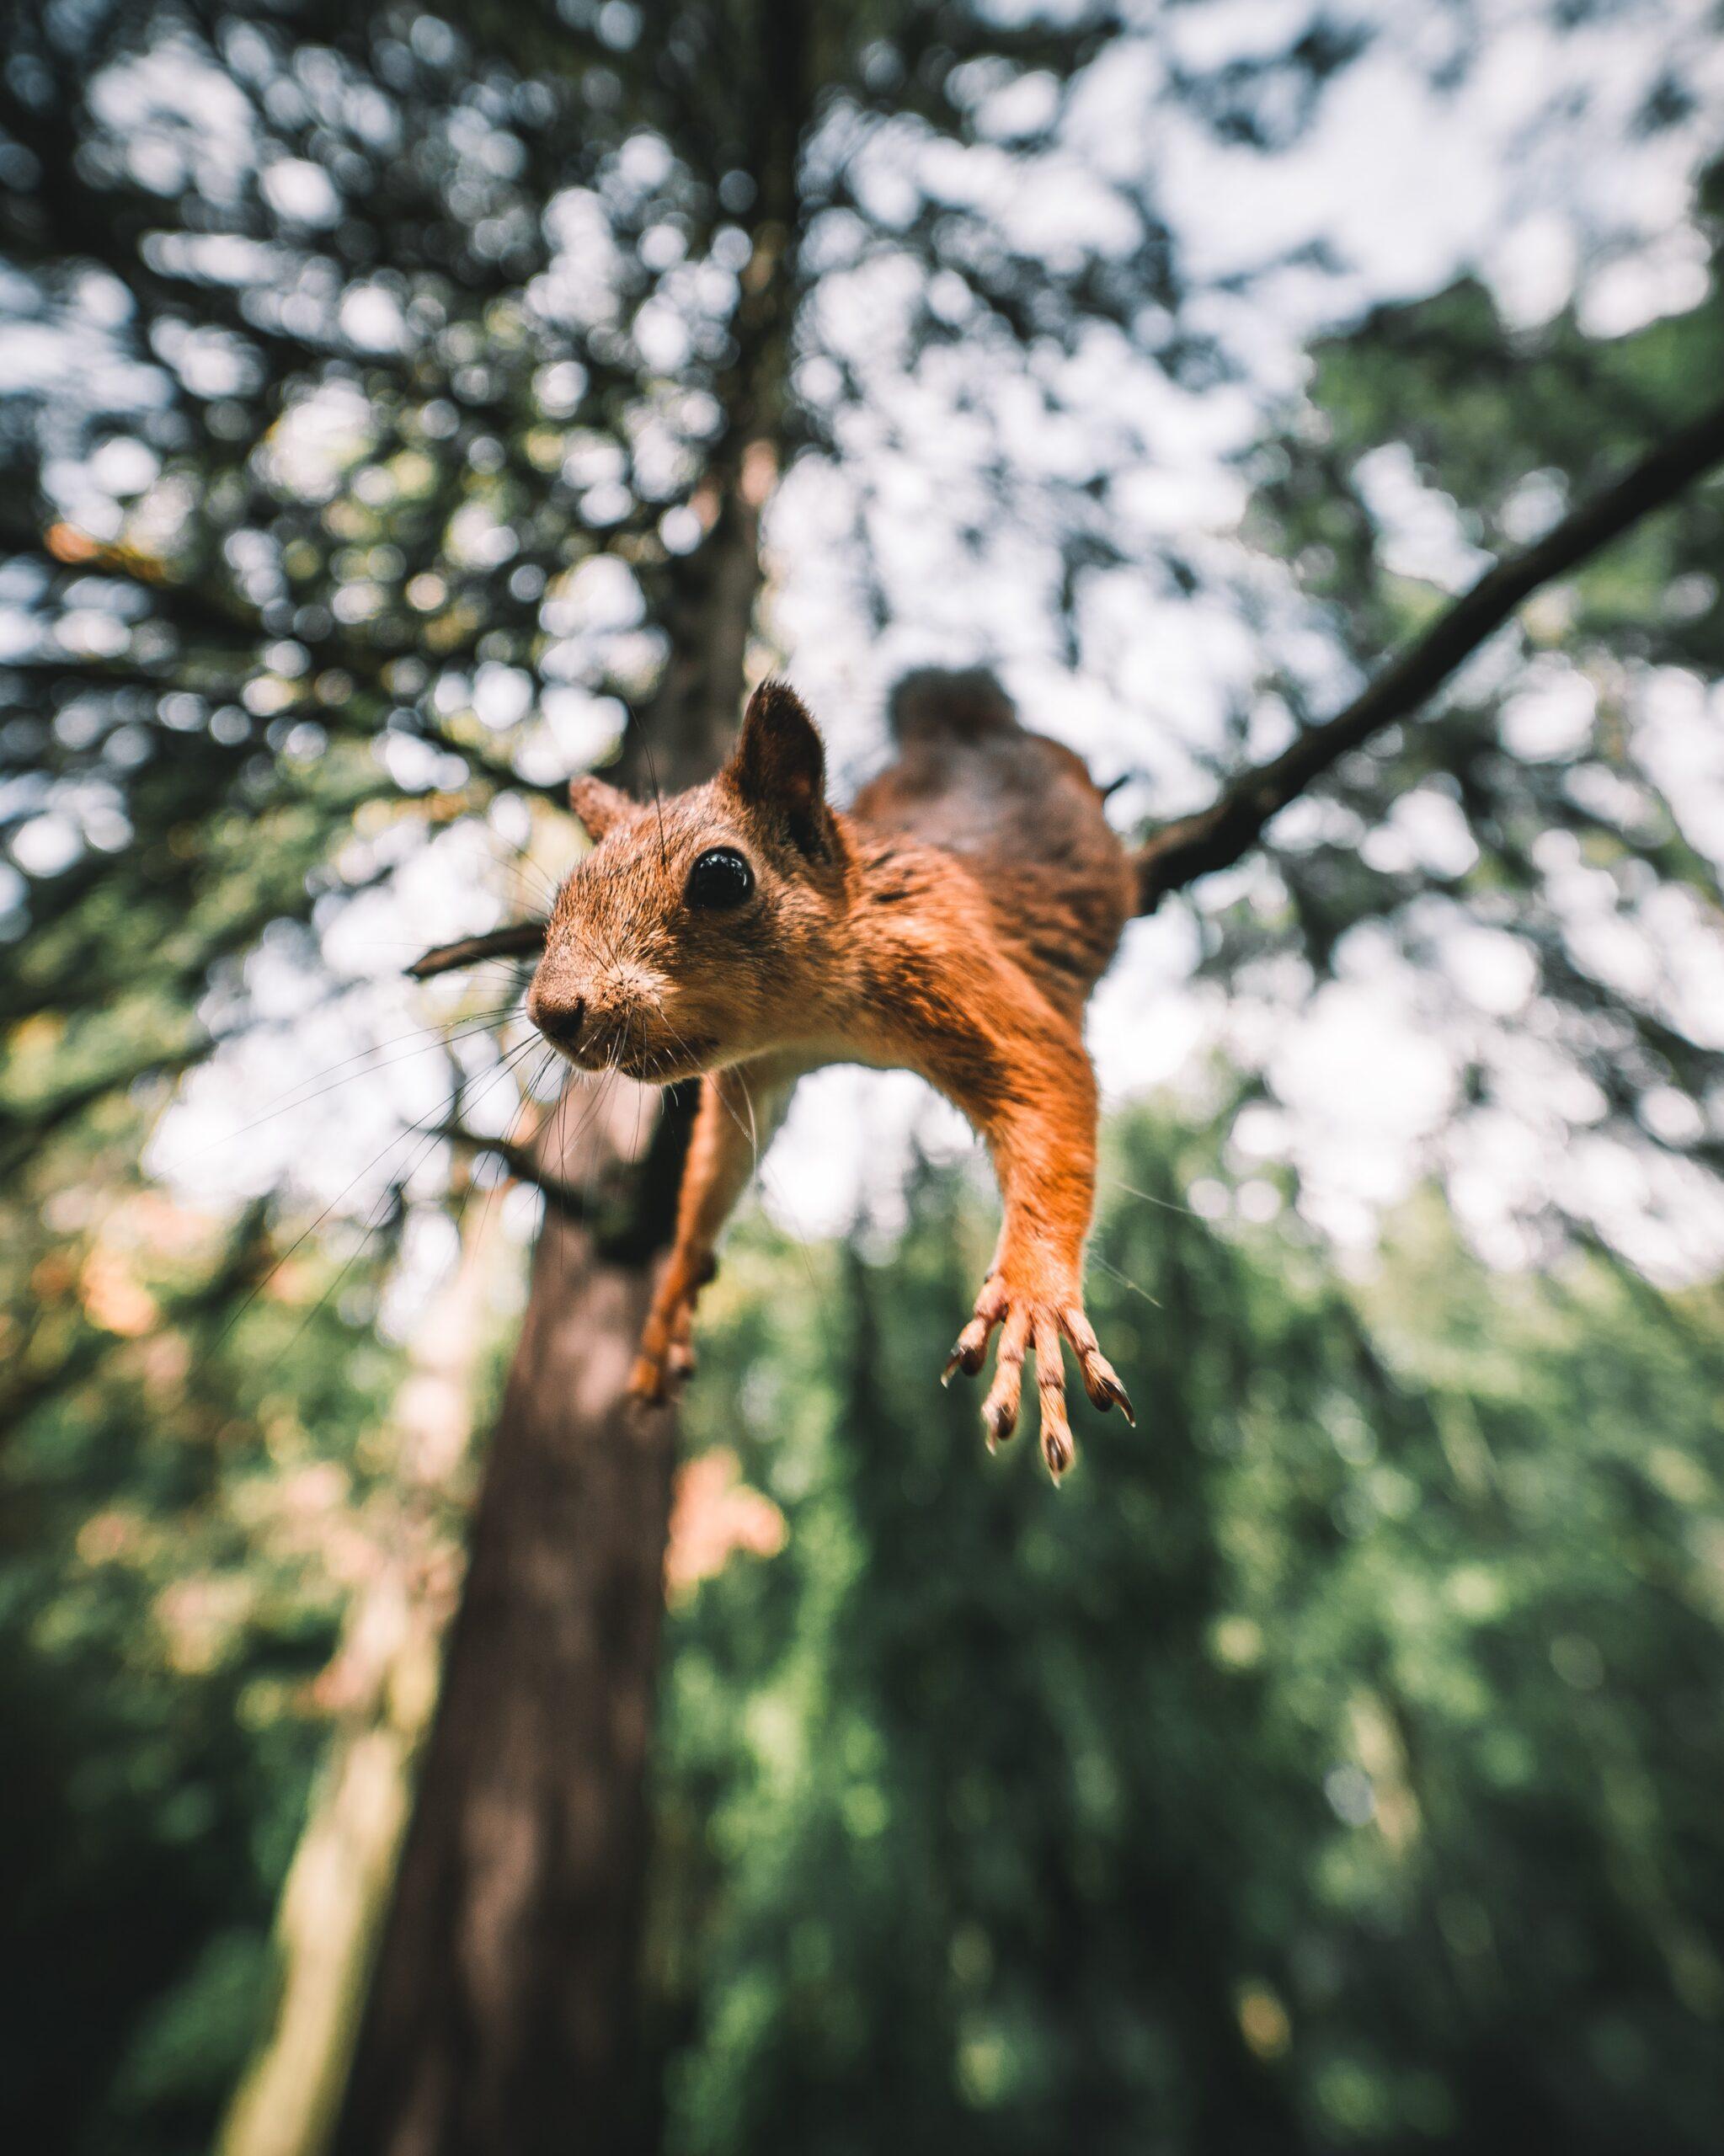 andrey-svistunov-Squirrel in mid launch up close-unsplash